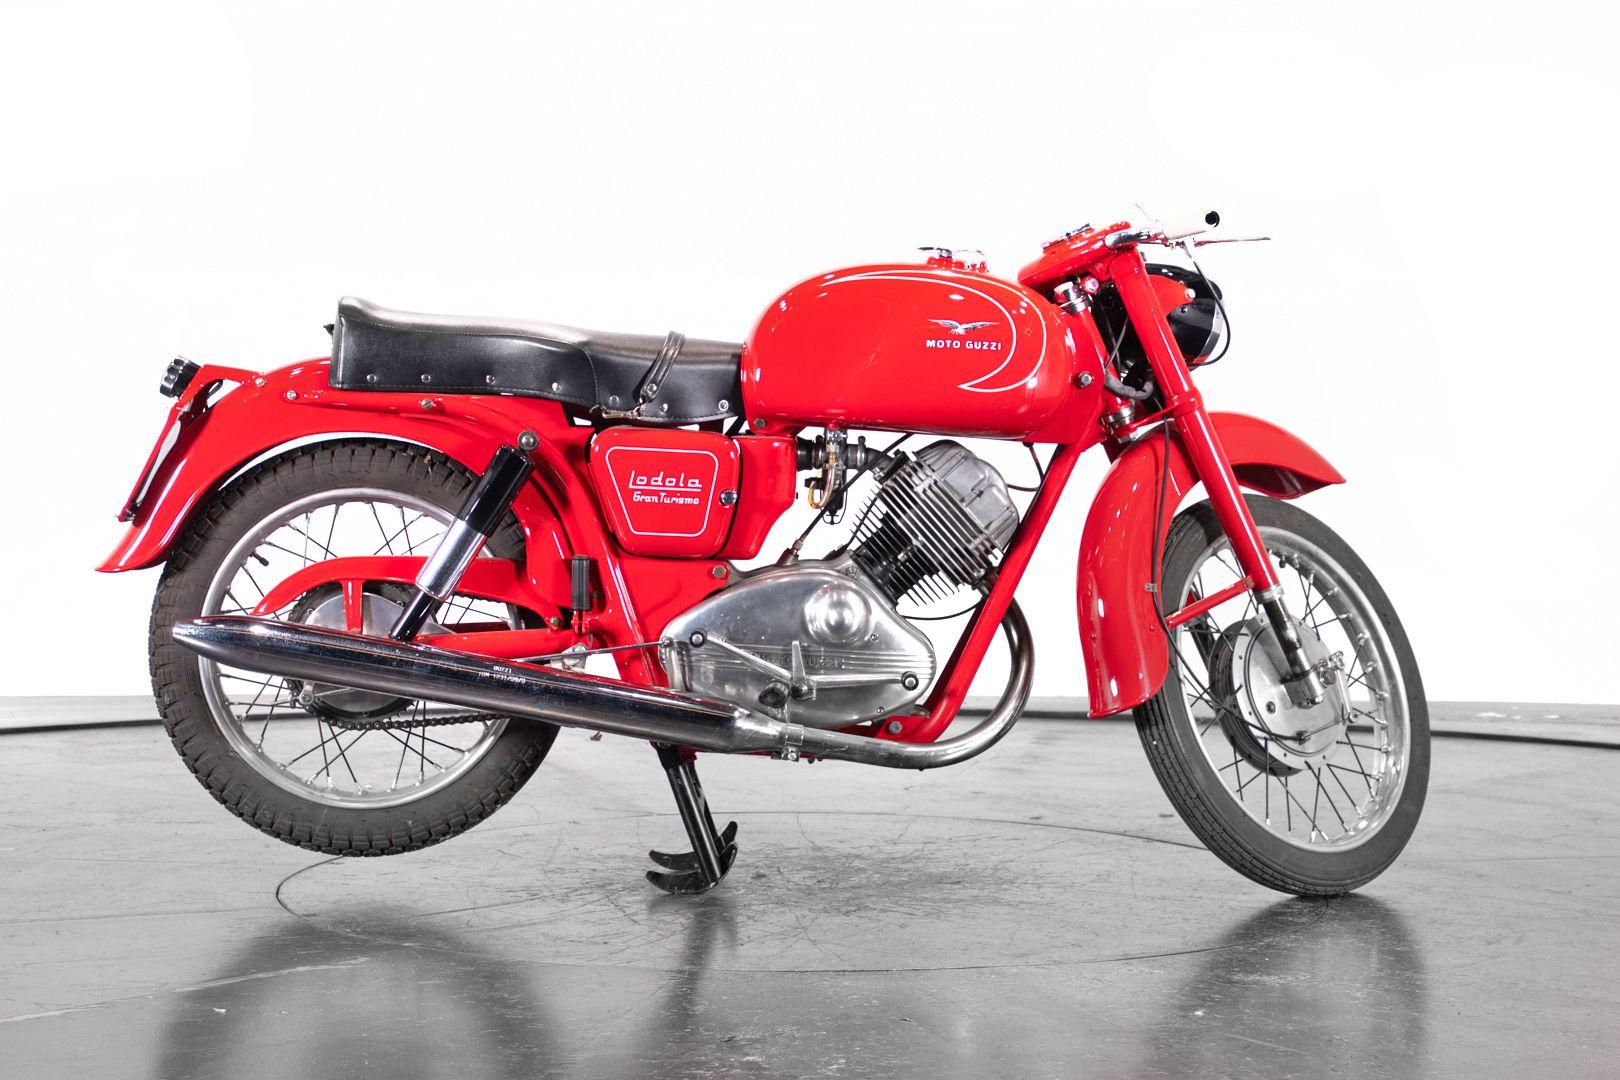 1959 Moto Guzzi Lodola 235 GT 41877